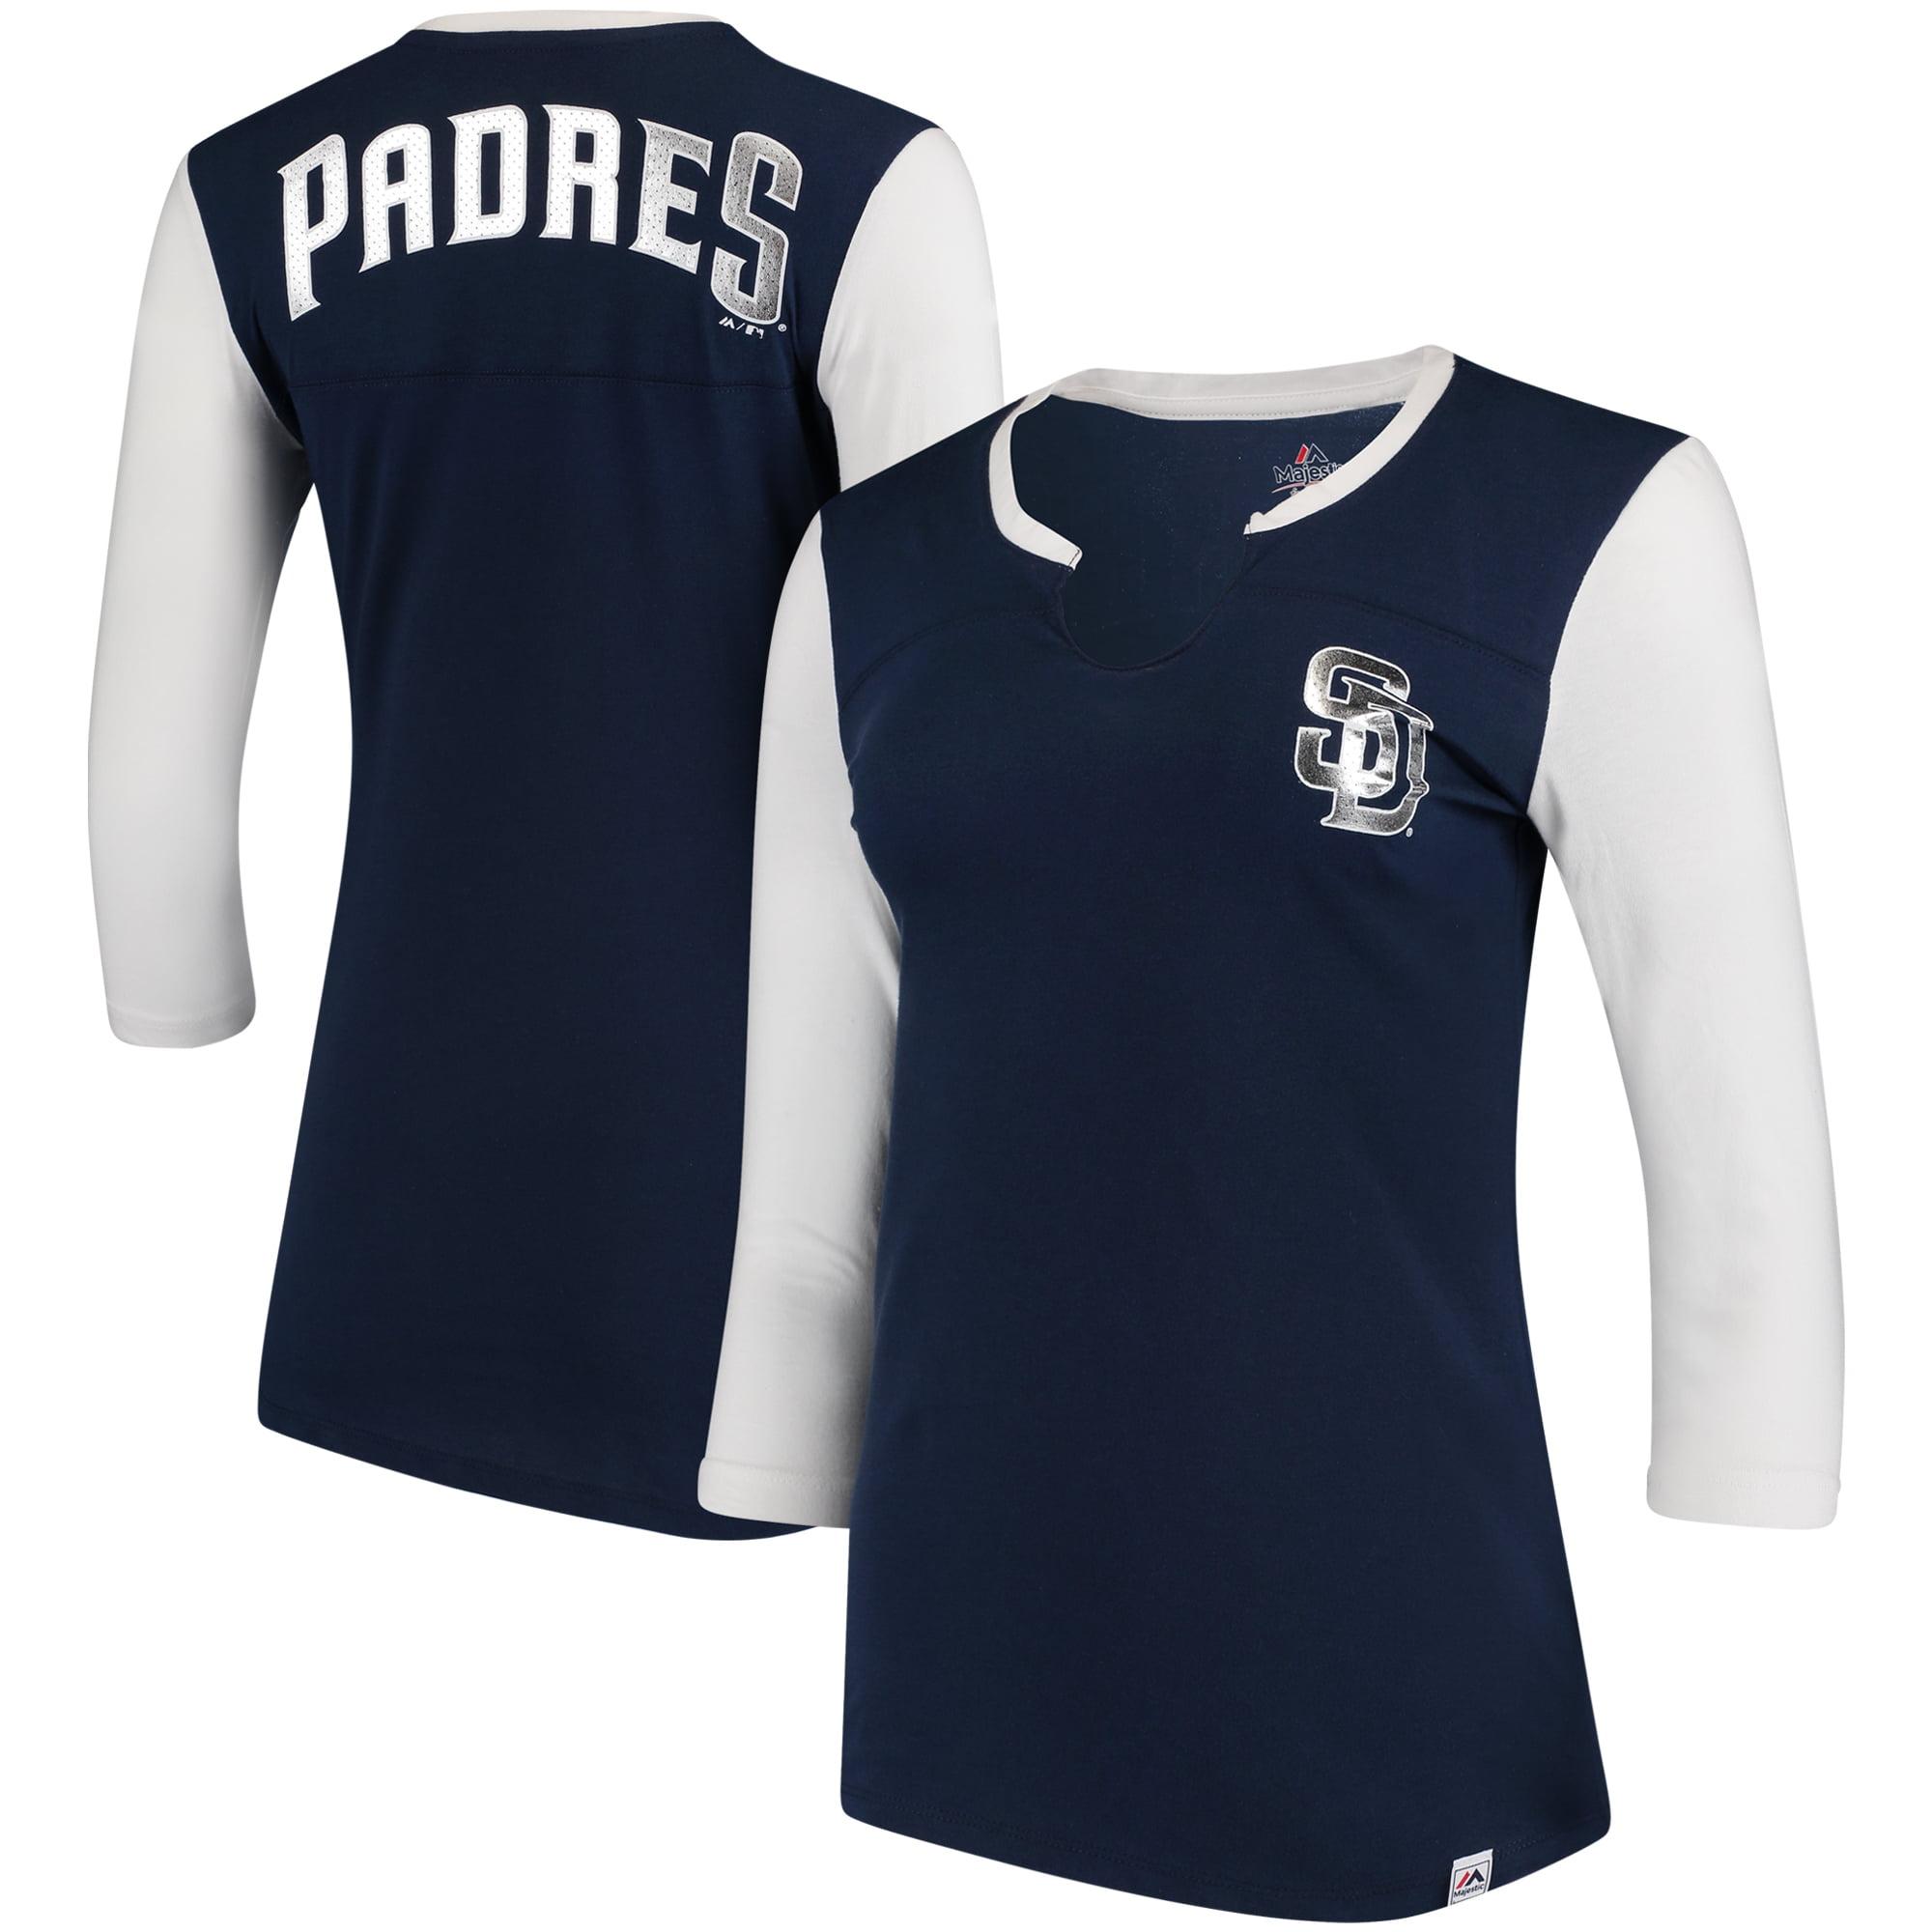 San Diego Padres Majestic Women's Above Average Three-Quarter Sleeve V-Notch T-Shirt - Navy/White